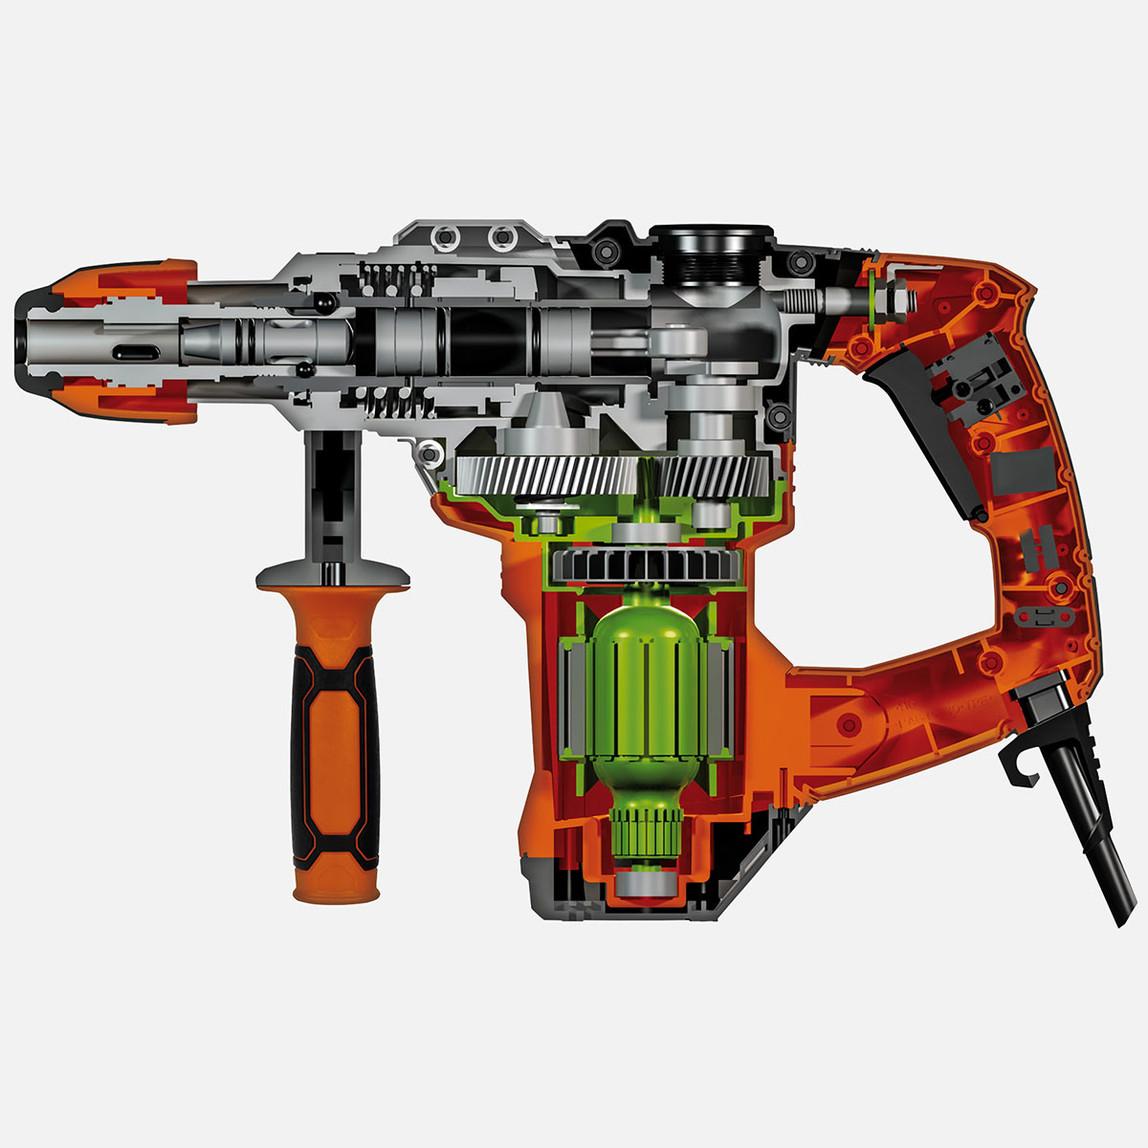 Toolson PRO-HM9 1050W SDS Max Kırıcı Delici